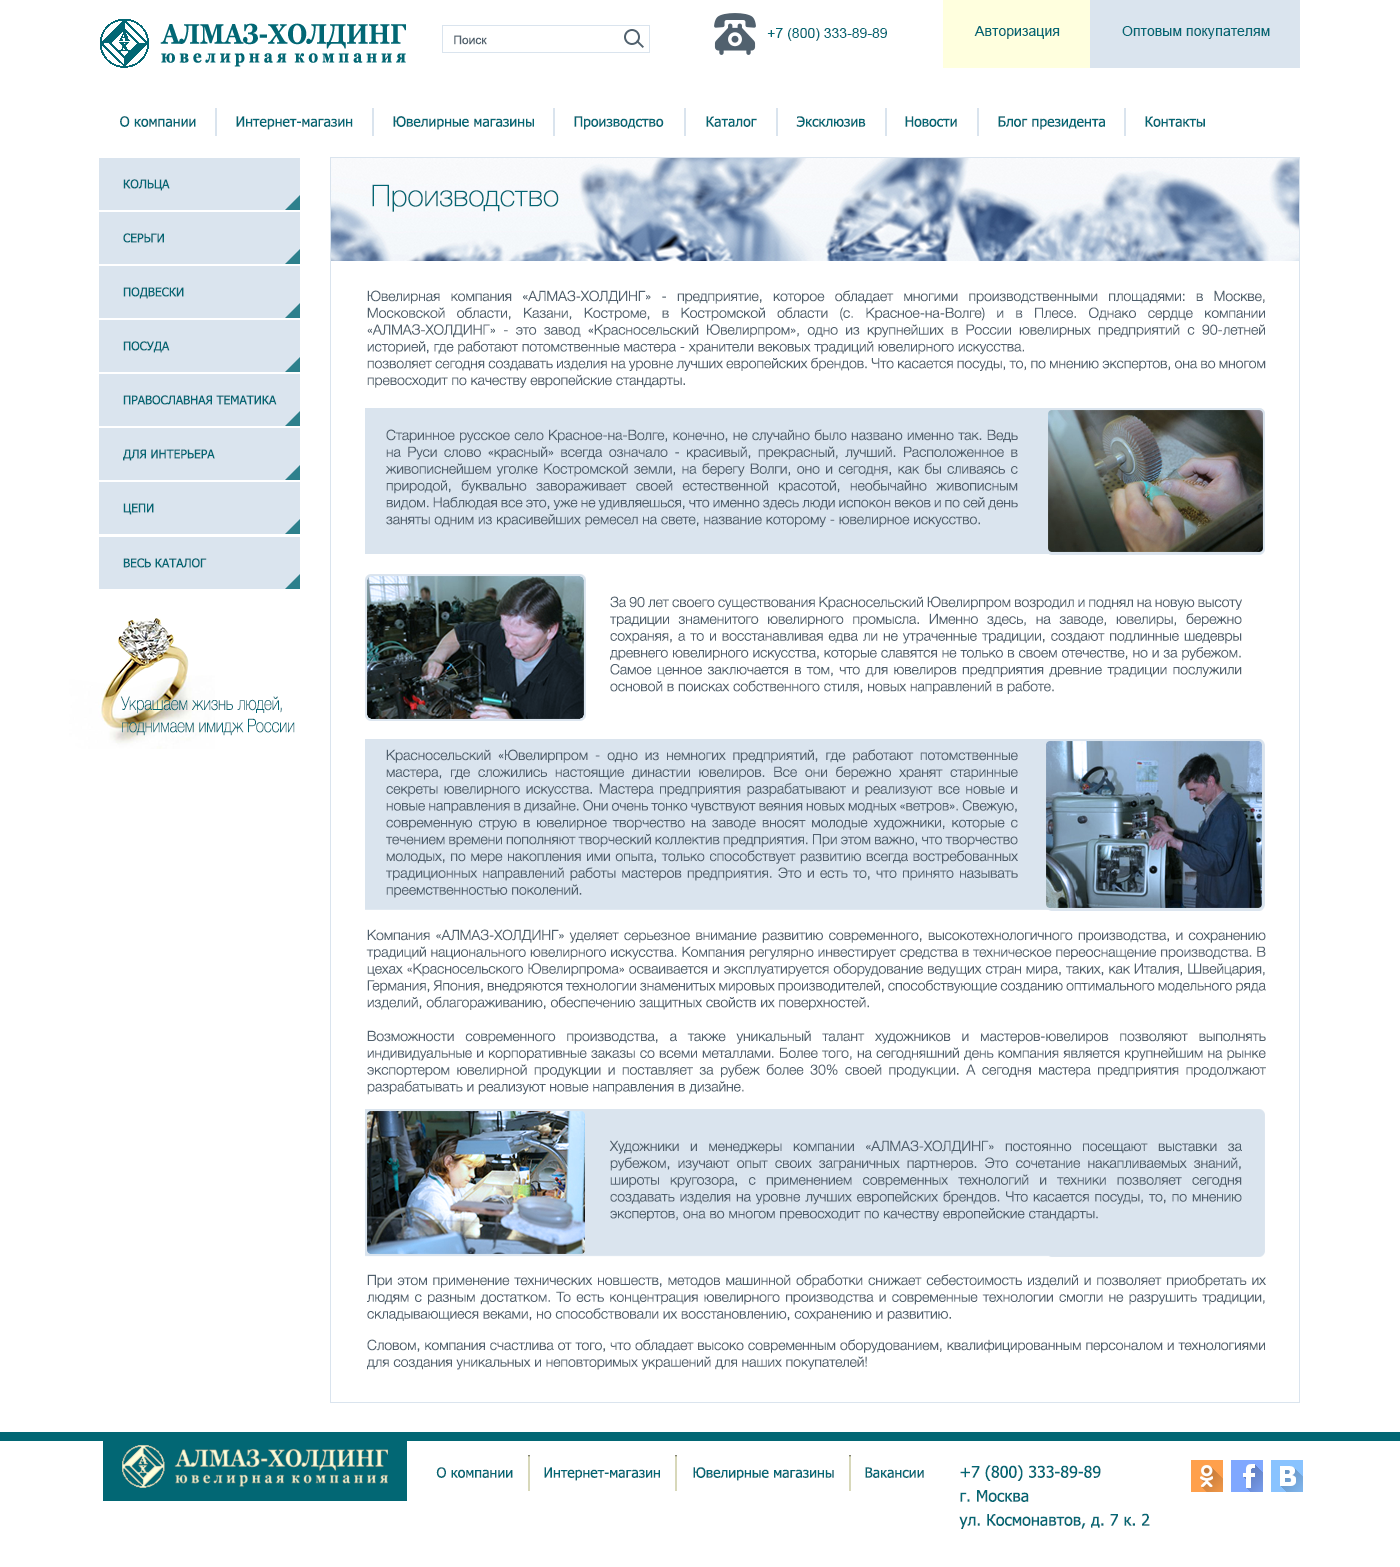 Дизайн сайта для ювелирной компании Алмаз-Холдинг фото f_79253173aa6ae889.png